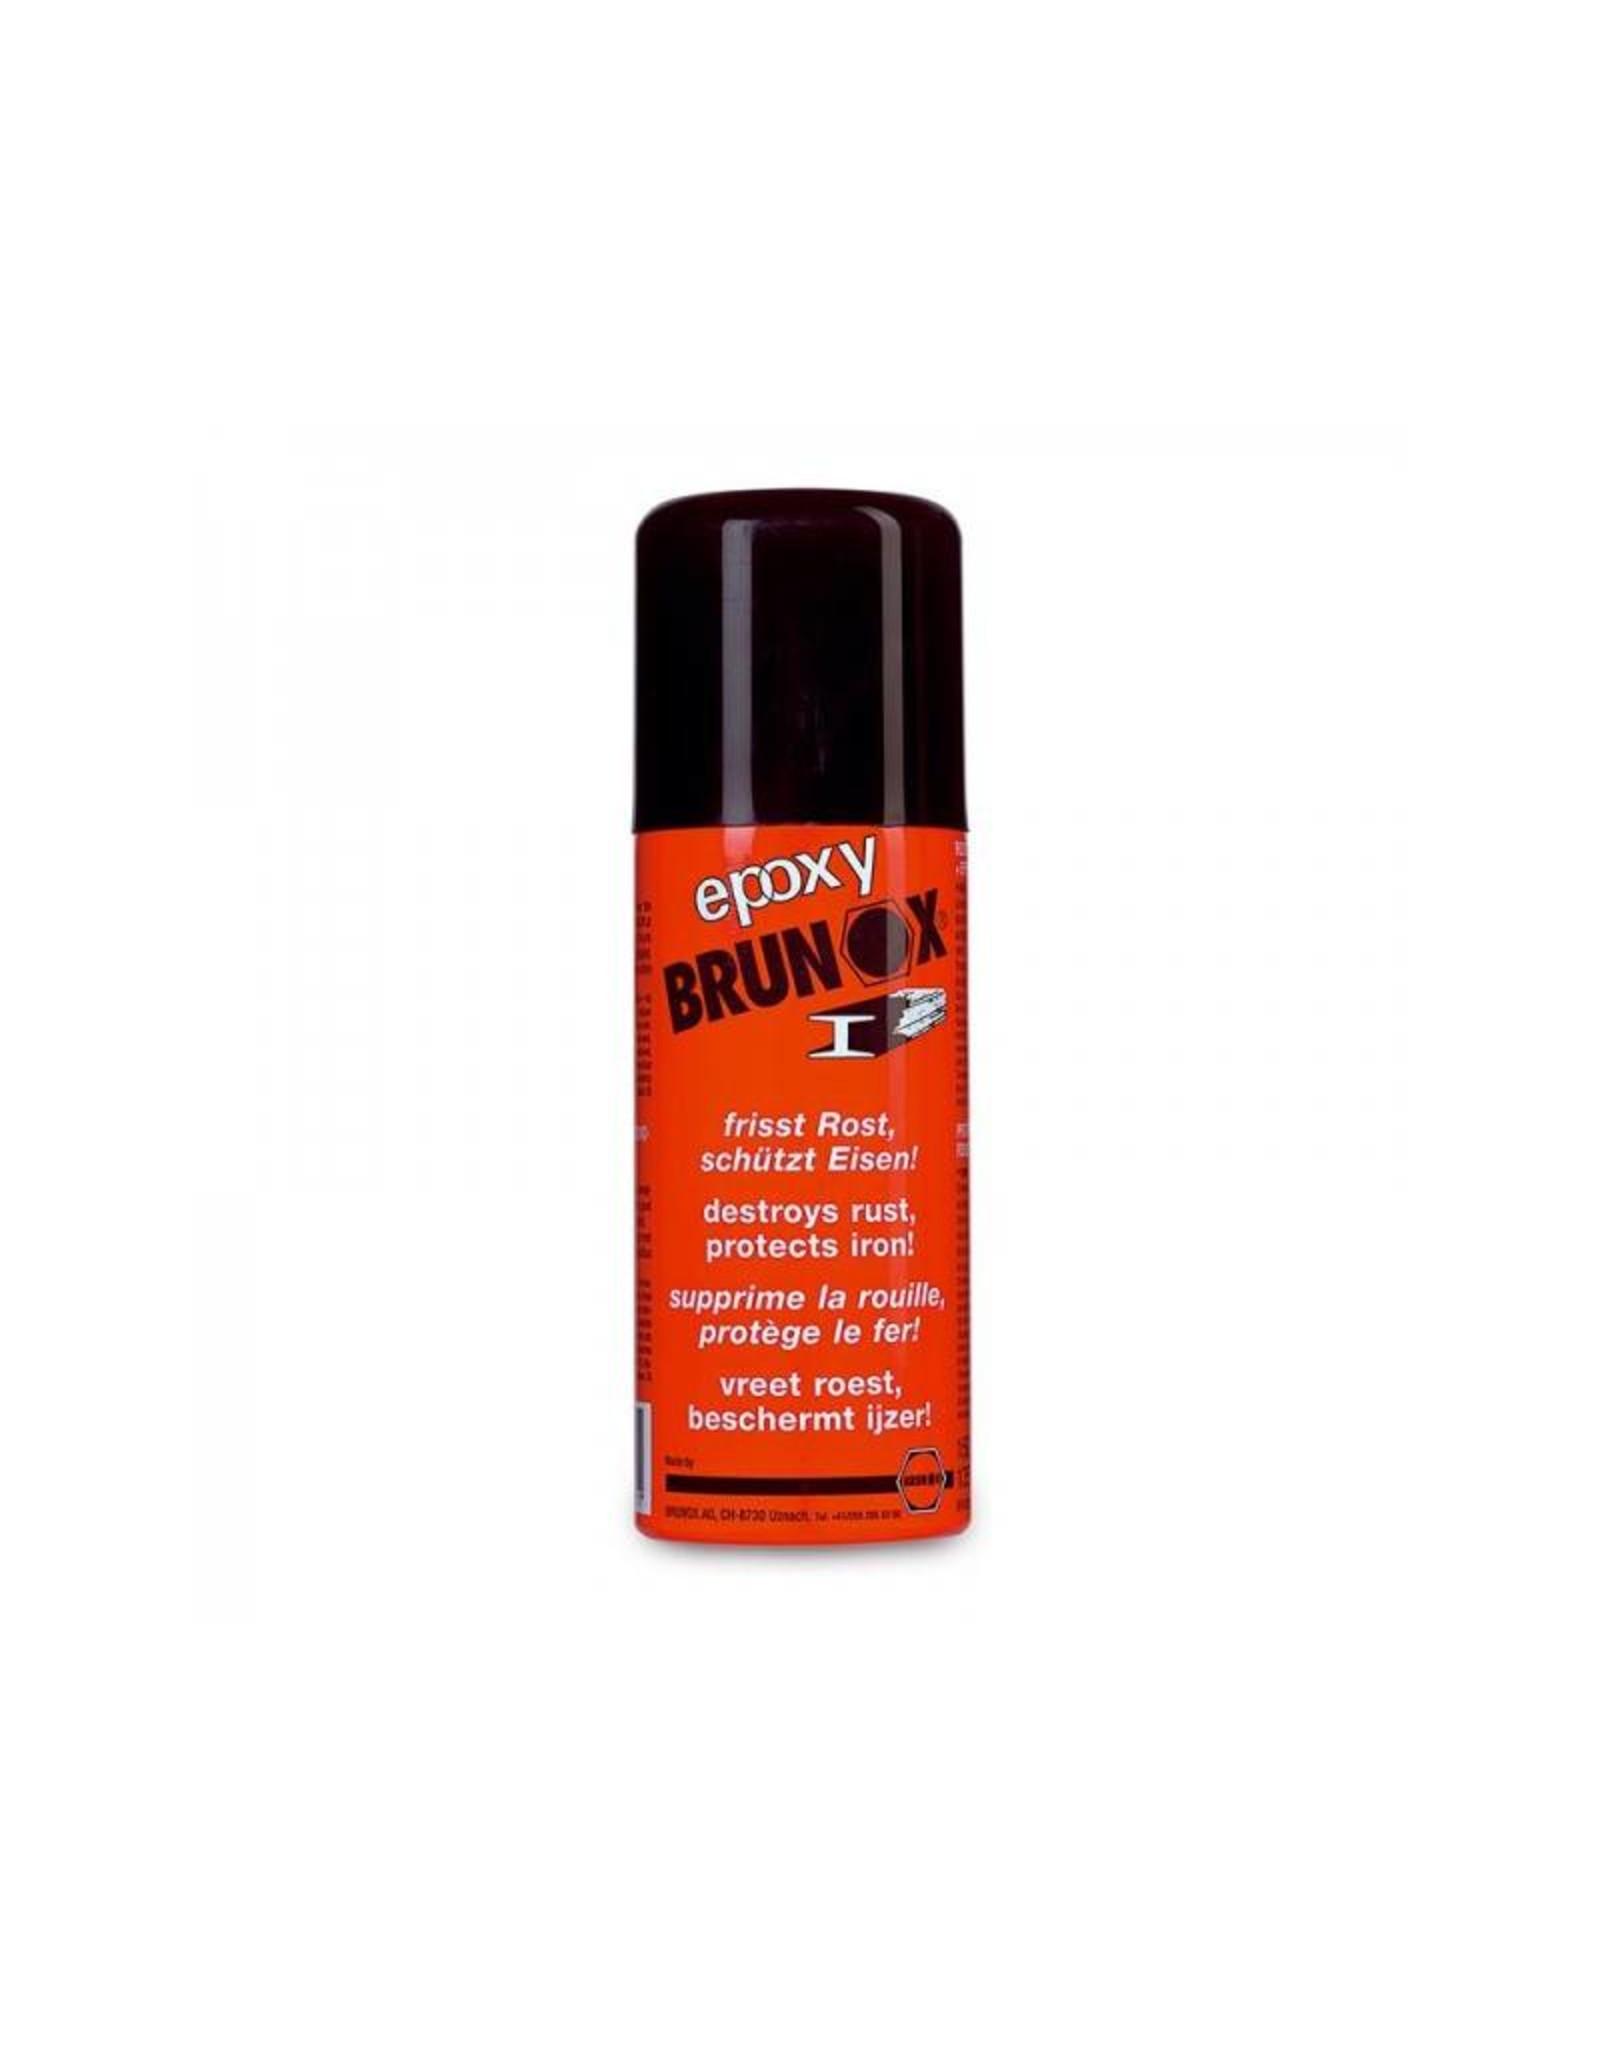 BRUNOX? Epoxy spray 150ml roeststop